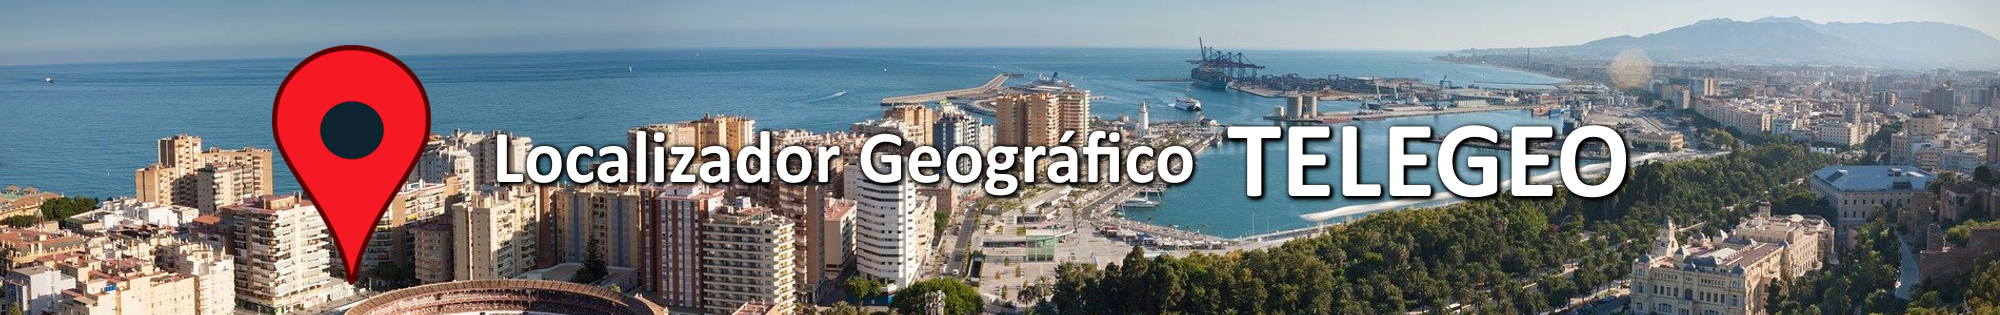 Localizador Geográfico Telegeo